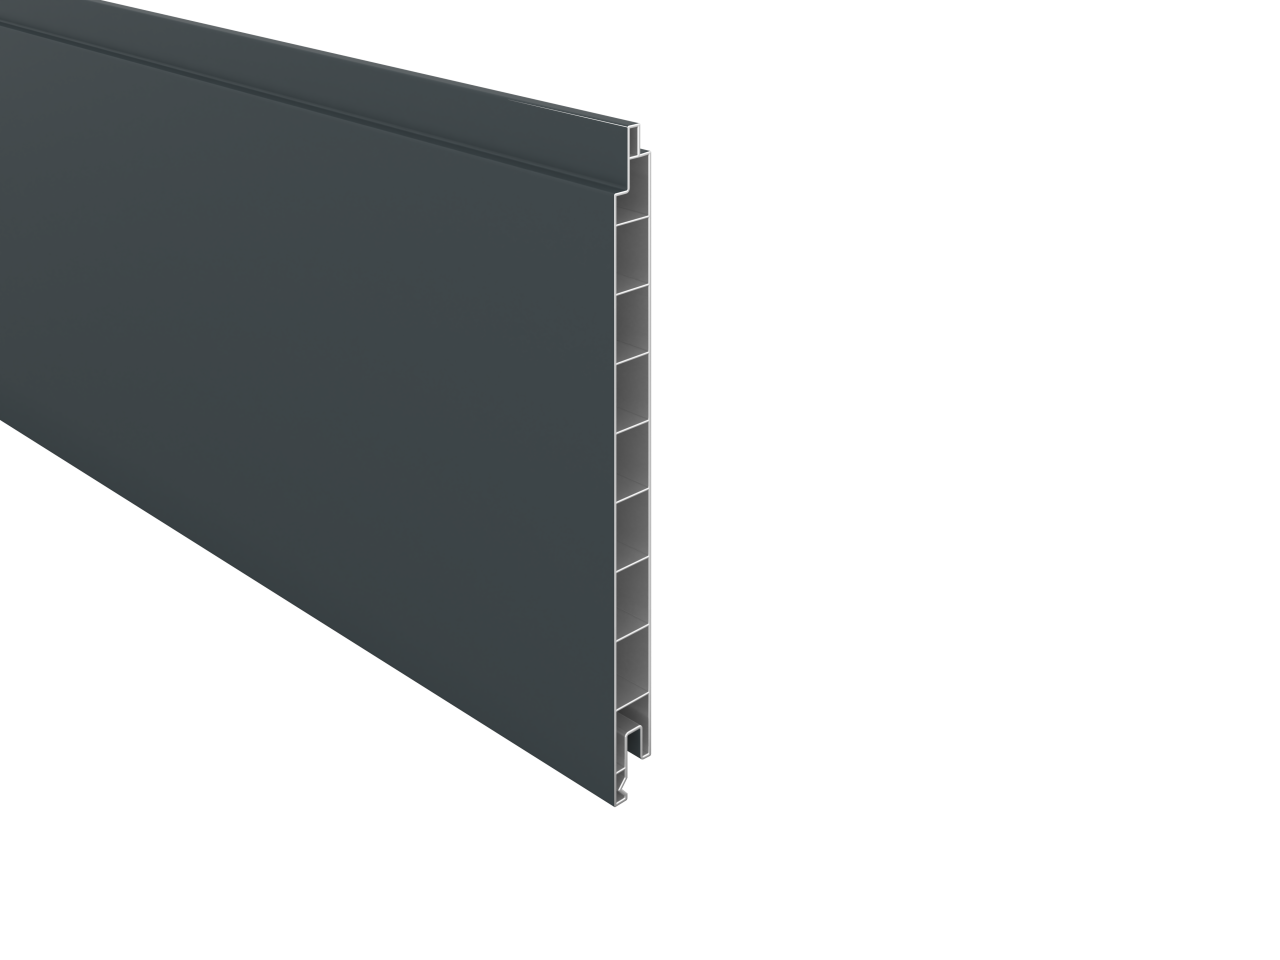 BALTIC-Serie KS-Profilbrett 17 x 200 x 1760 mm, ANTHRAZIT